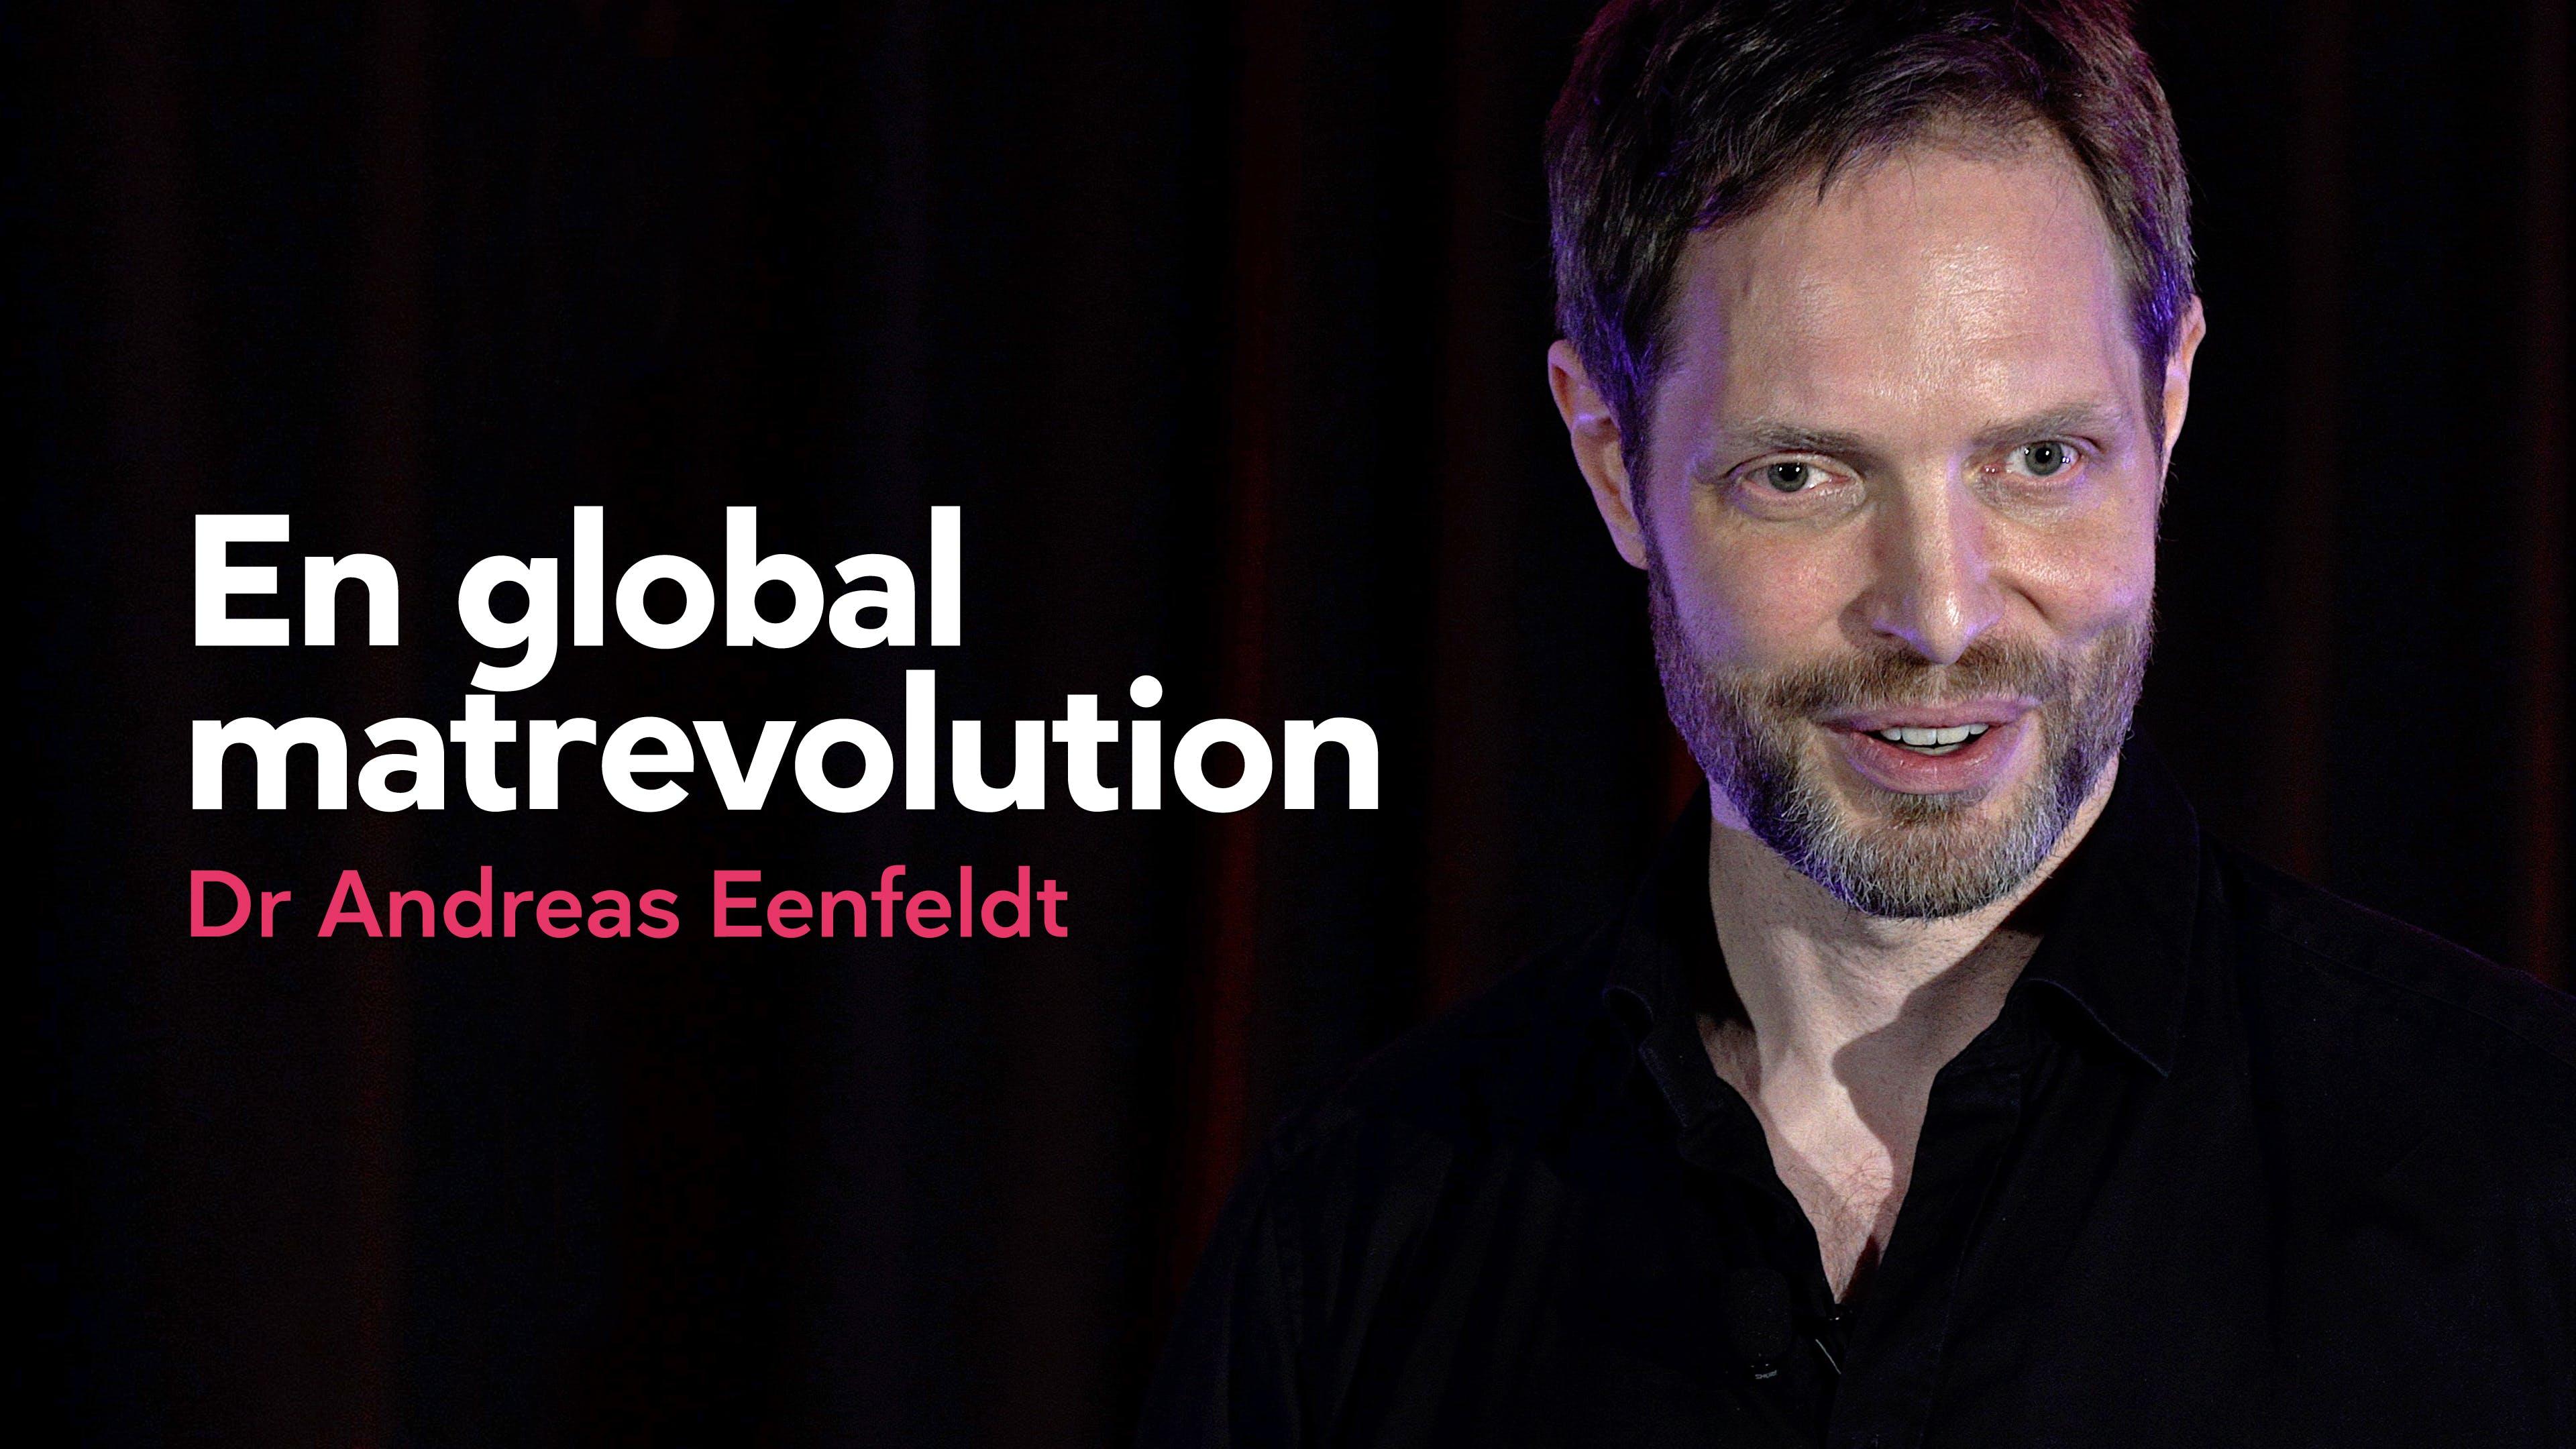 En global matrevolution